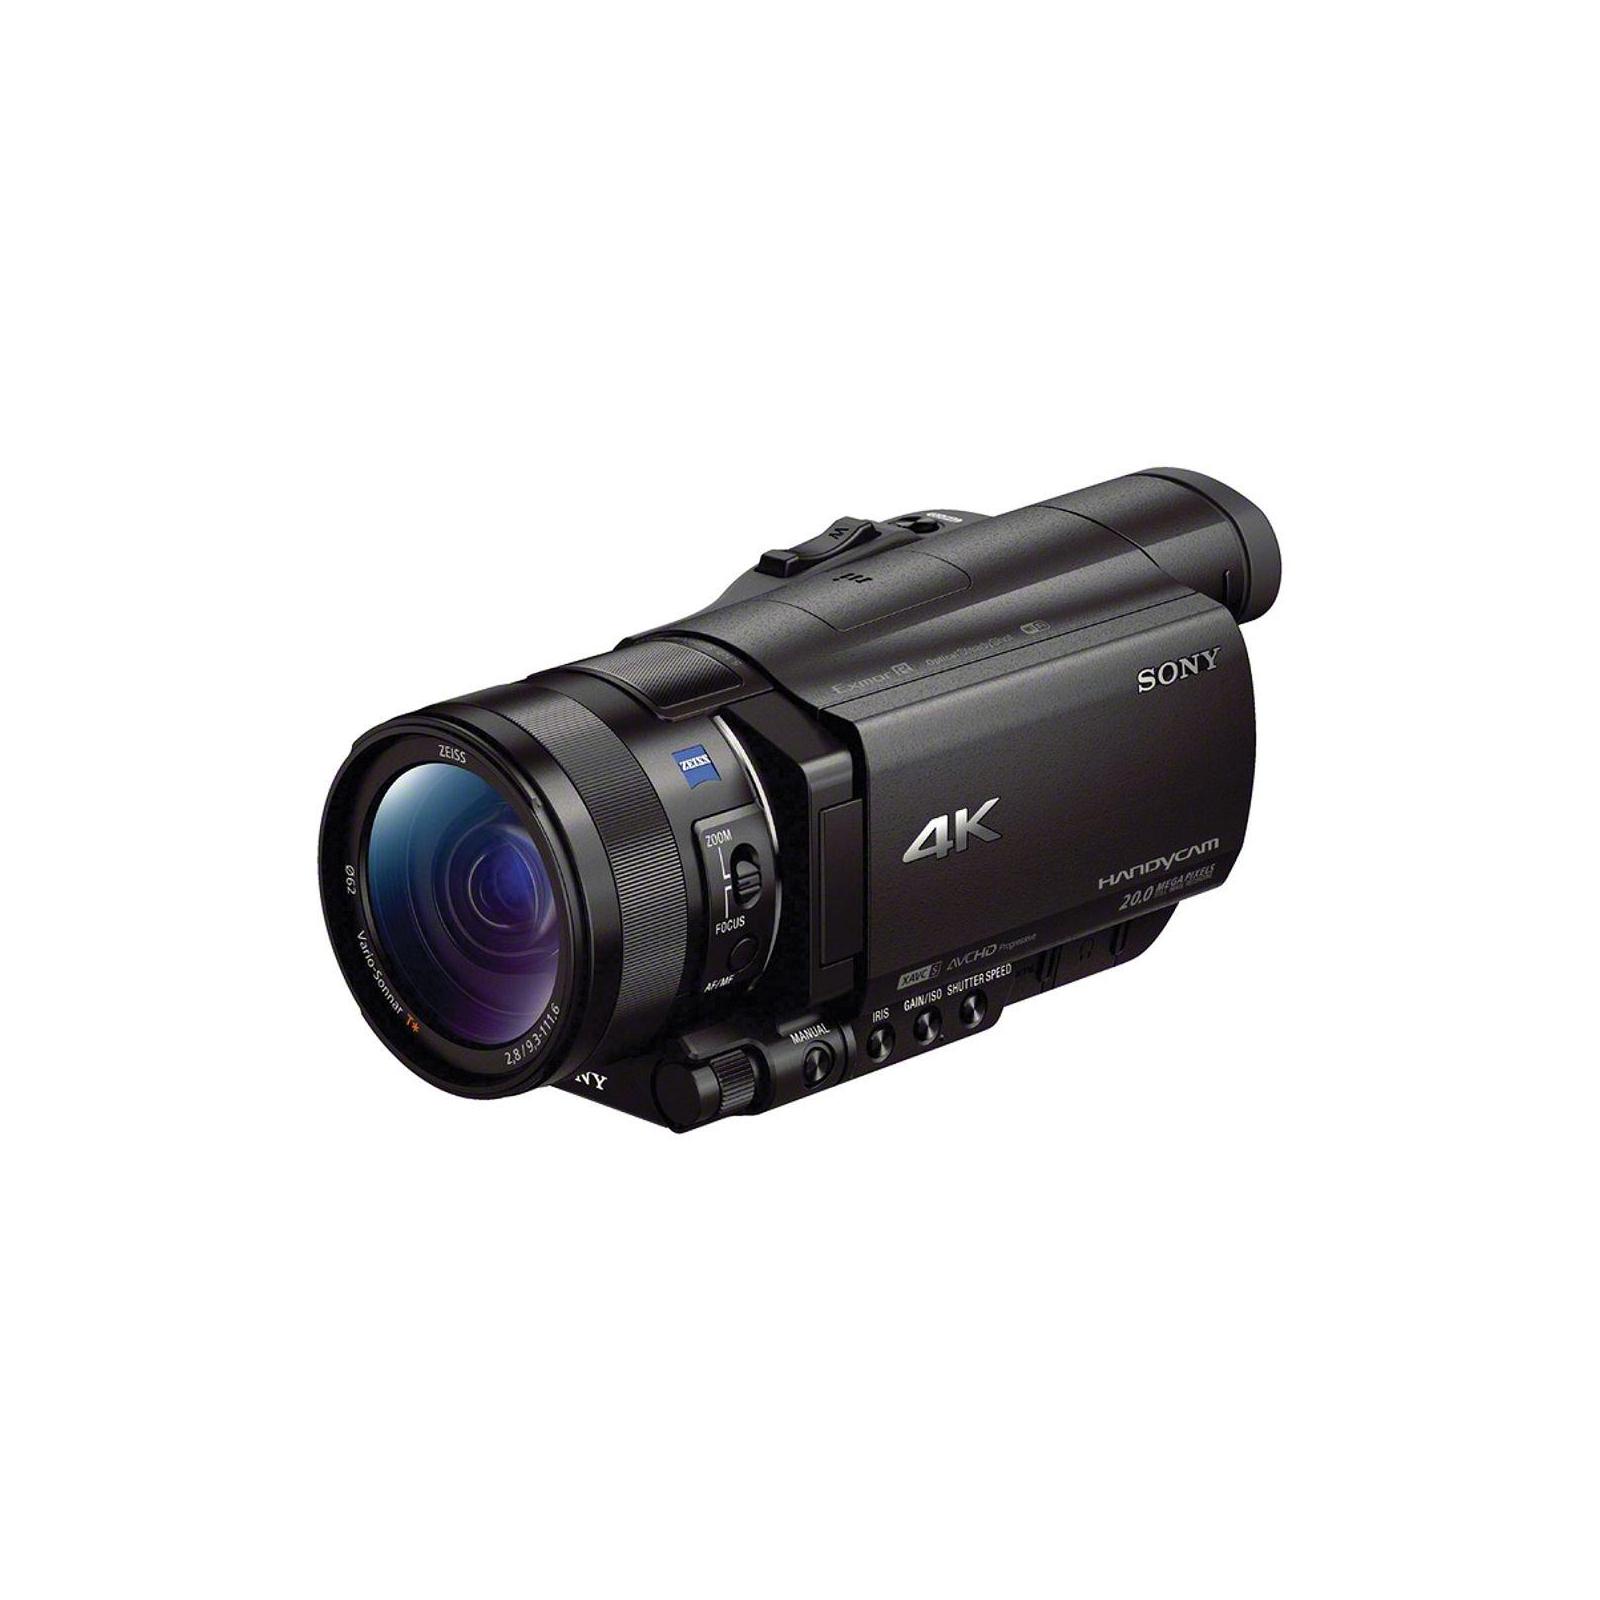 Цифровая видеокамера Sony Handycam FDR-AX700 Black (FDRAX700B.CEE)